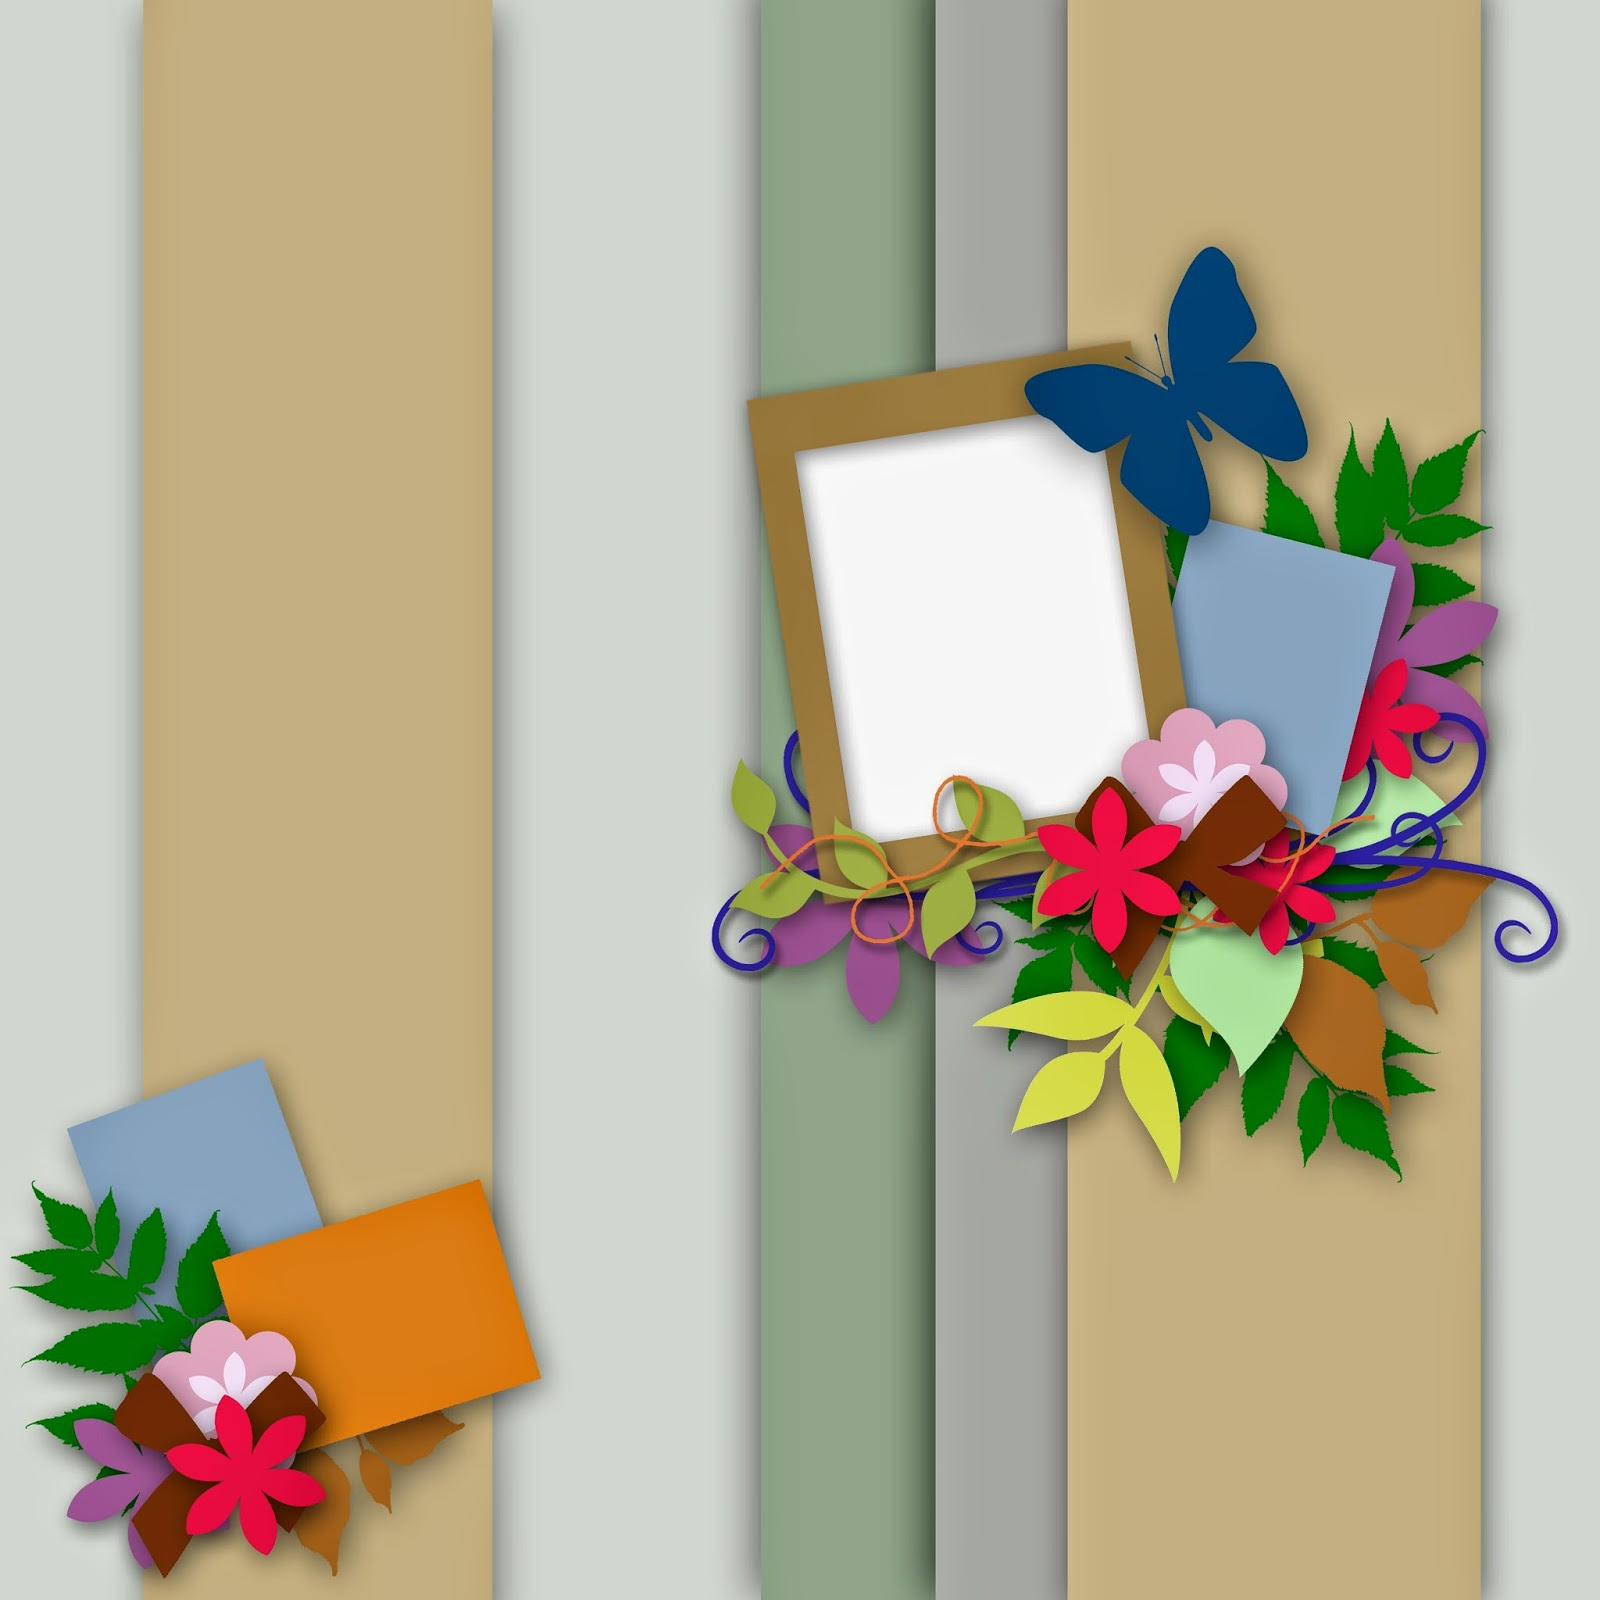 http://1.bp.blogspot.com/-lQixMzEhTdo/VMfXcFYtZVI/AAAAAAAABFE/CgylSBOZgas/s1600/OklahomaDawn012515_edited-1.jpg